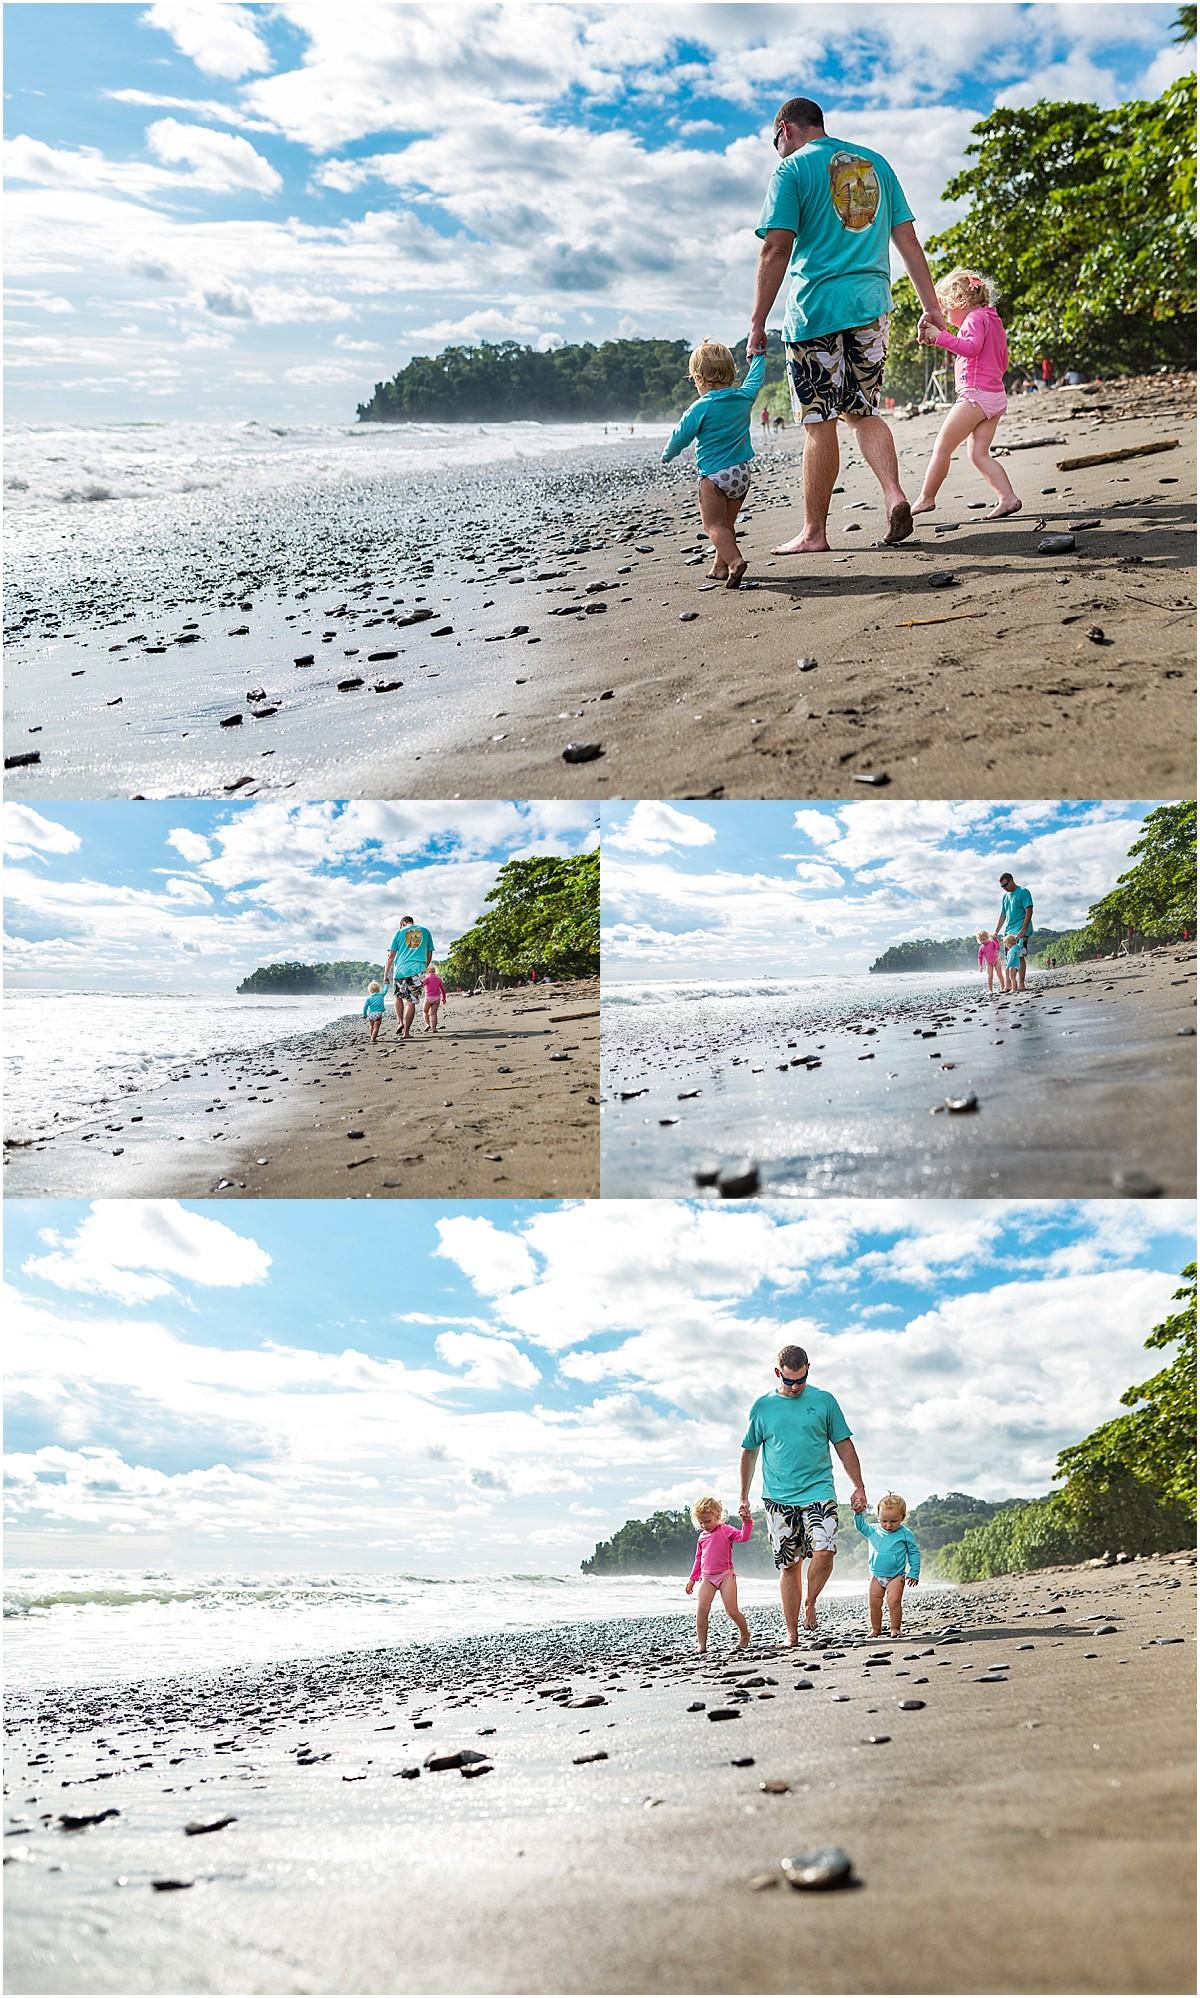 Ashley_Rogers_Photography_South_Florida_Photographer_Orlando_Photographer_Costa_Rica_Photographer_1199.jpg